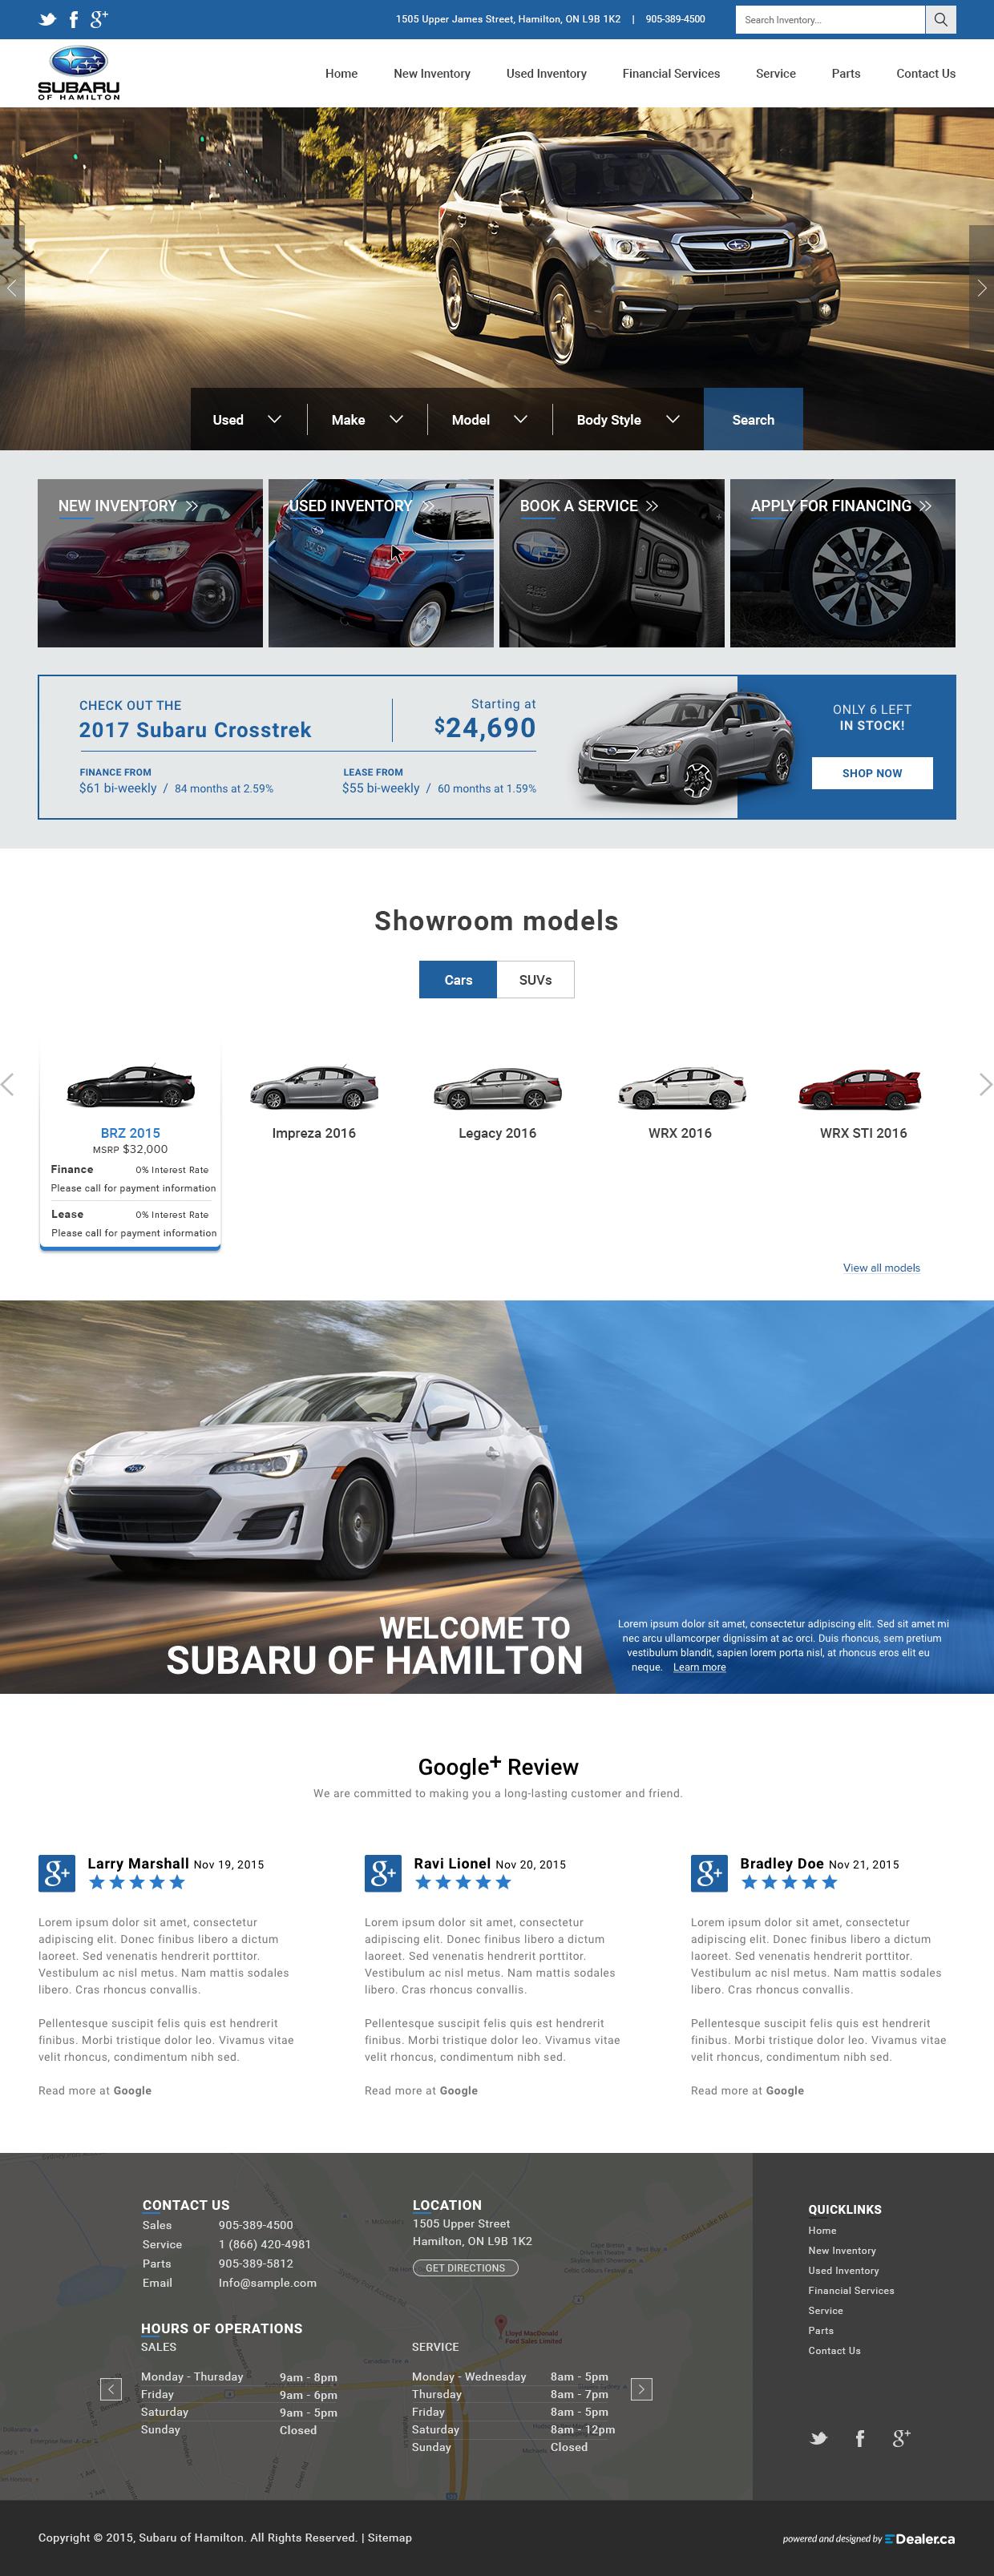 Subaru of Hamilton